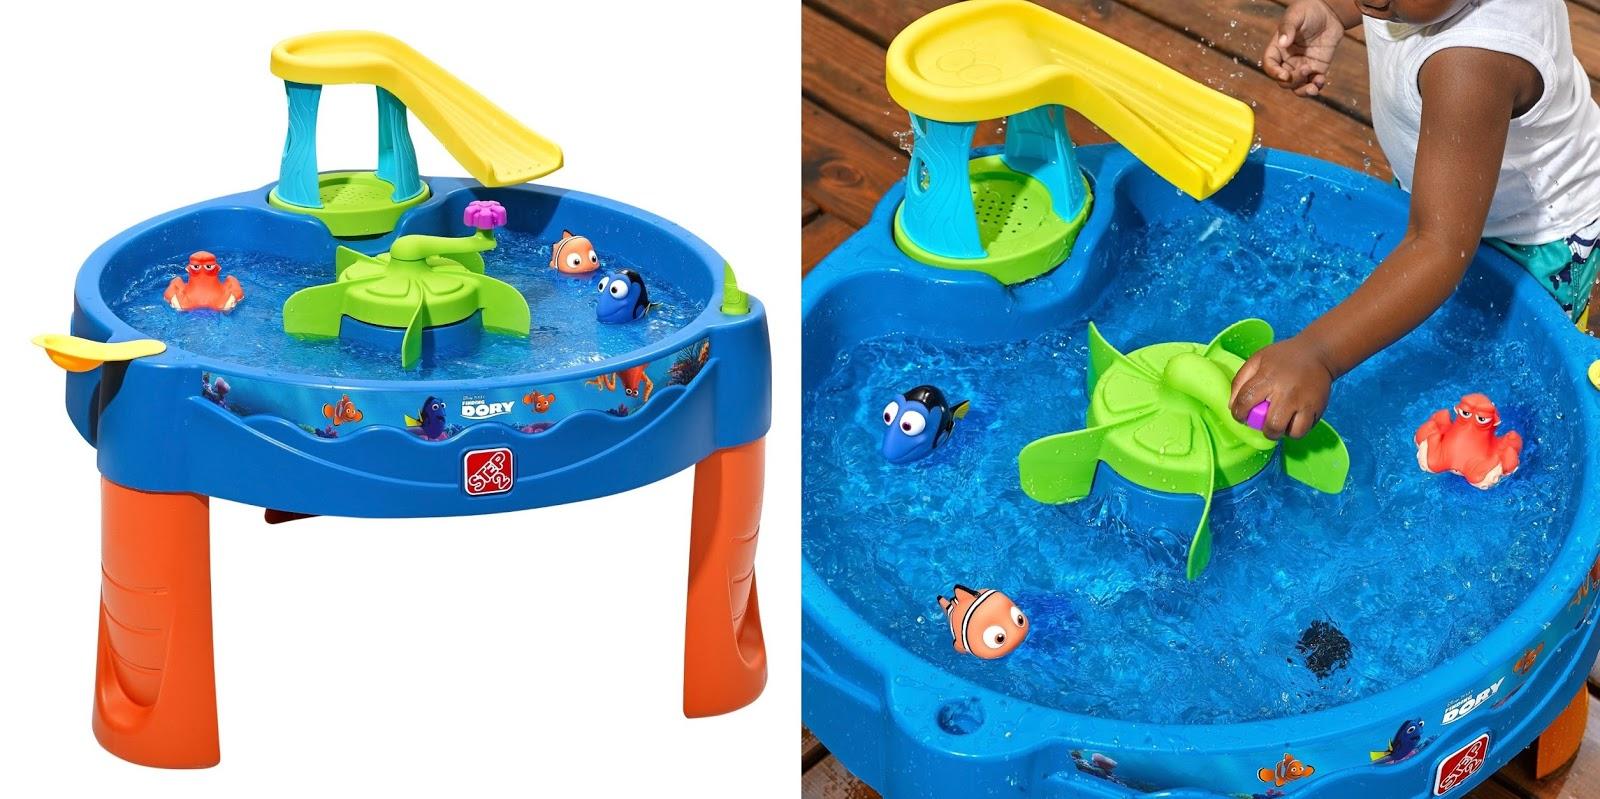 Pixar Post Products Finding Dory Swim Gear Kickboard